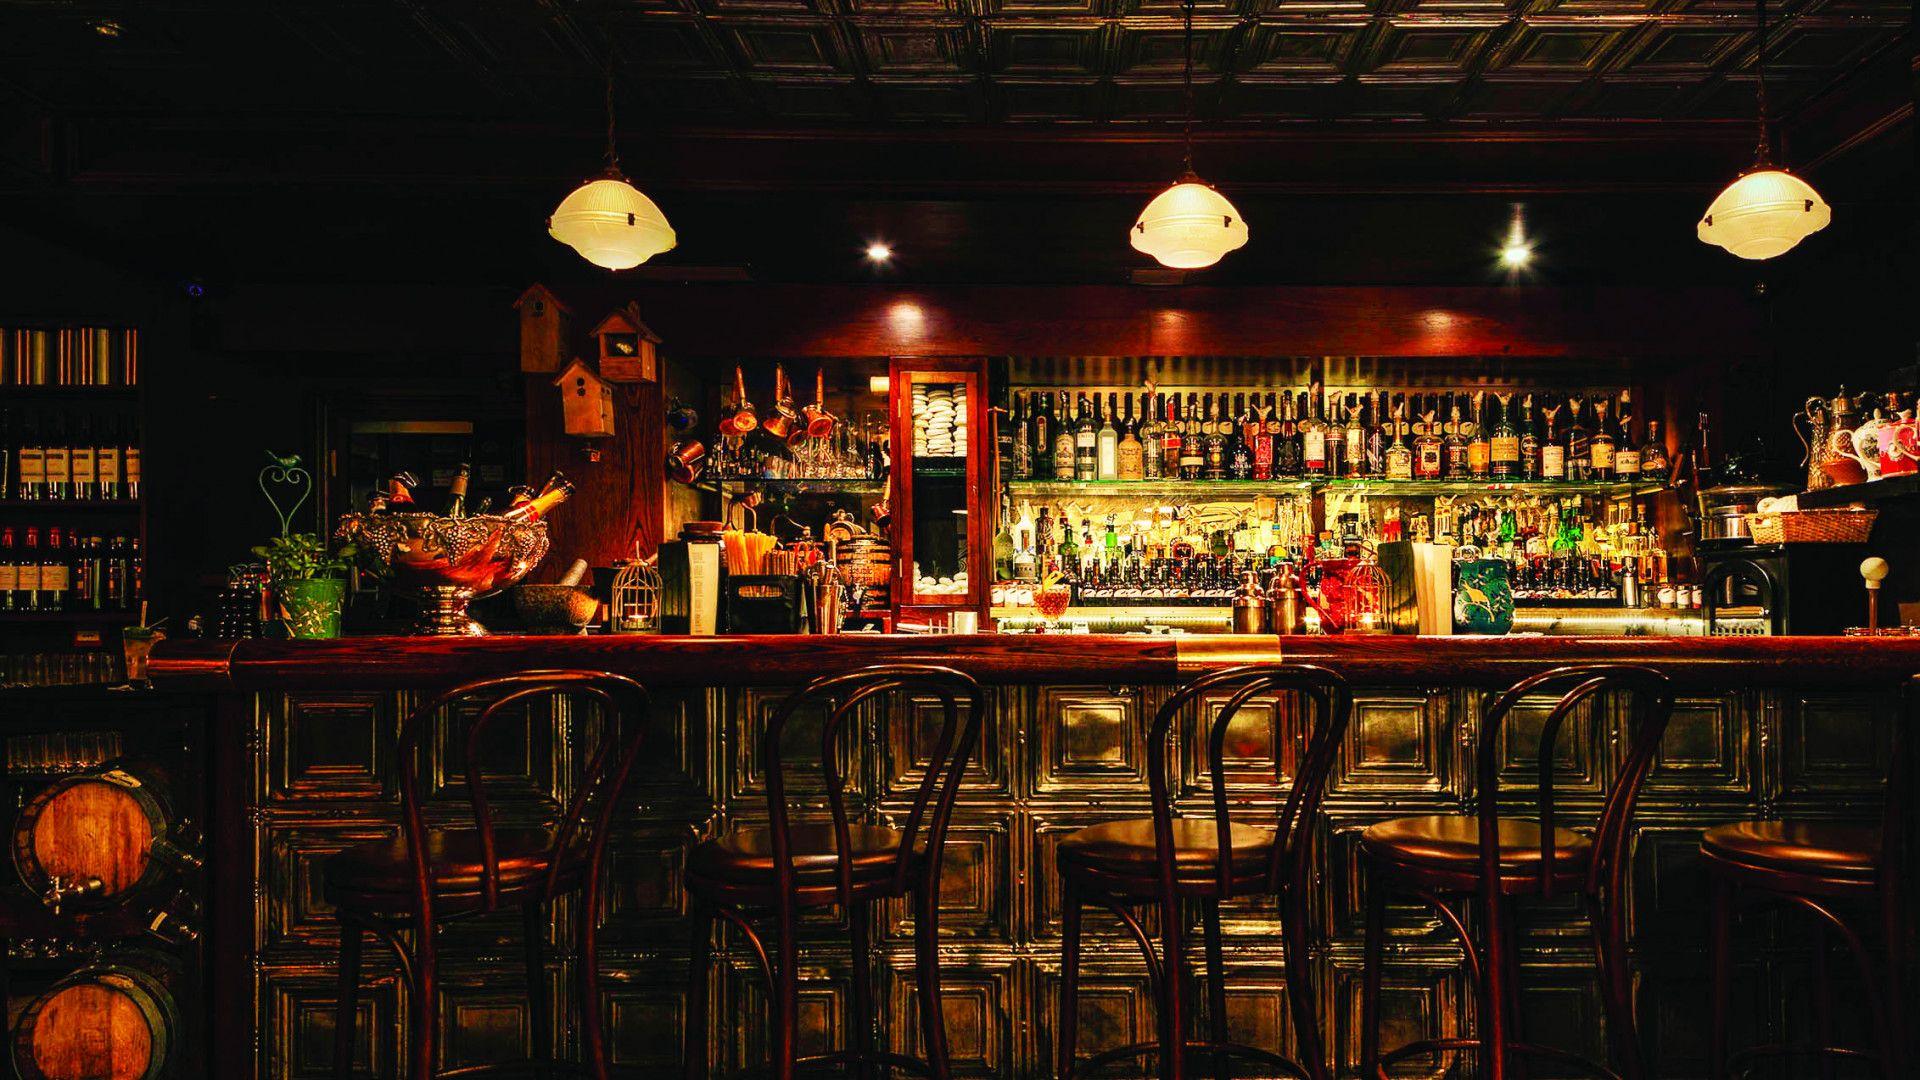 Bar wallpaper image